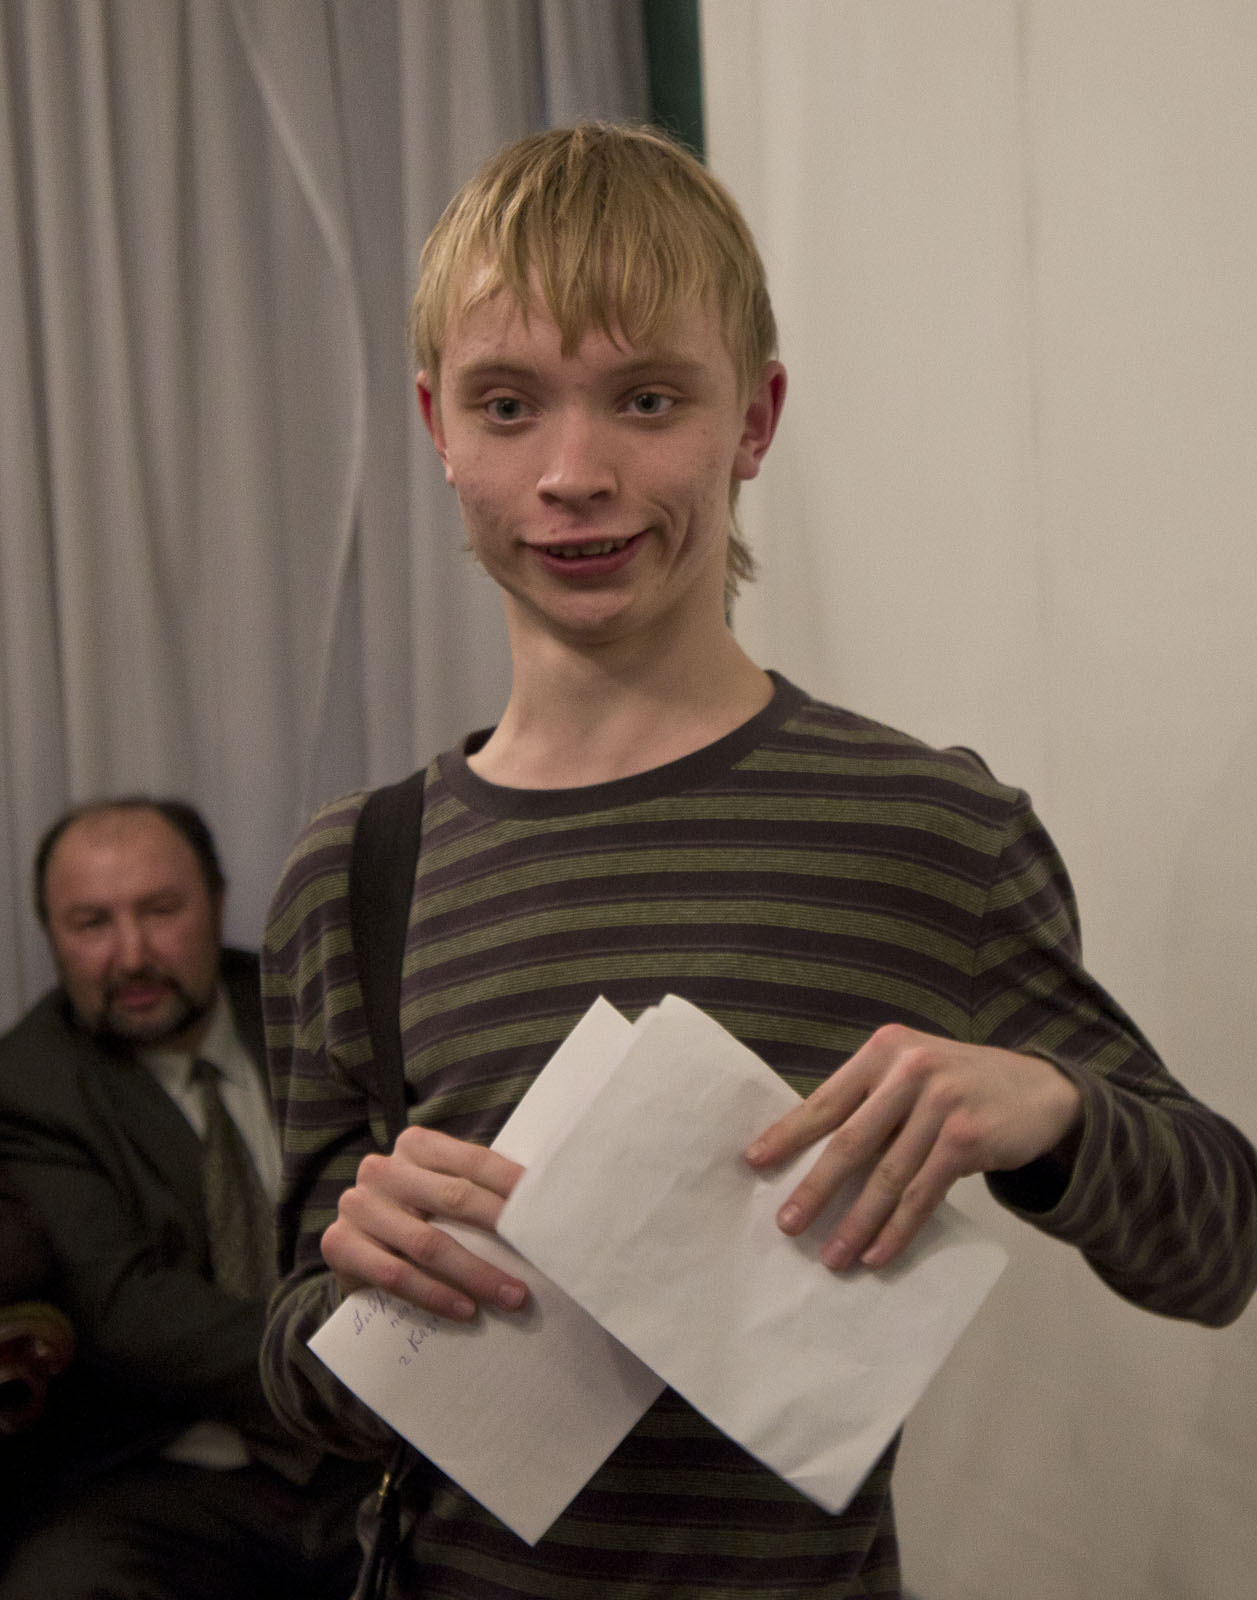 Фото №73598. Андрей Малов